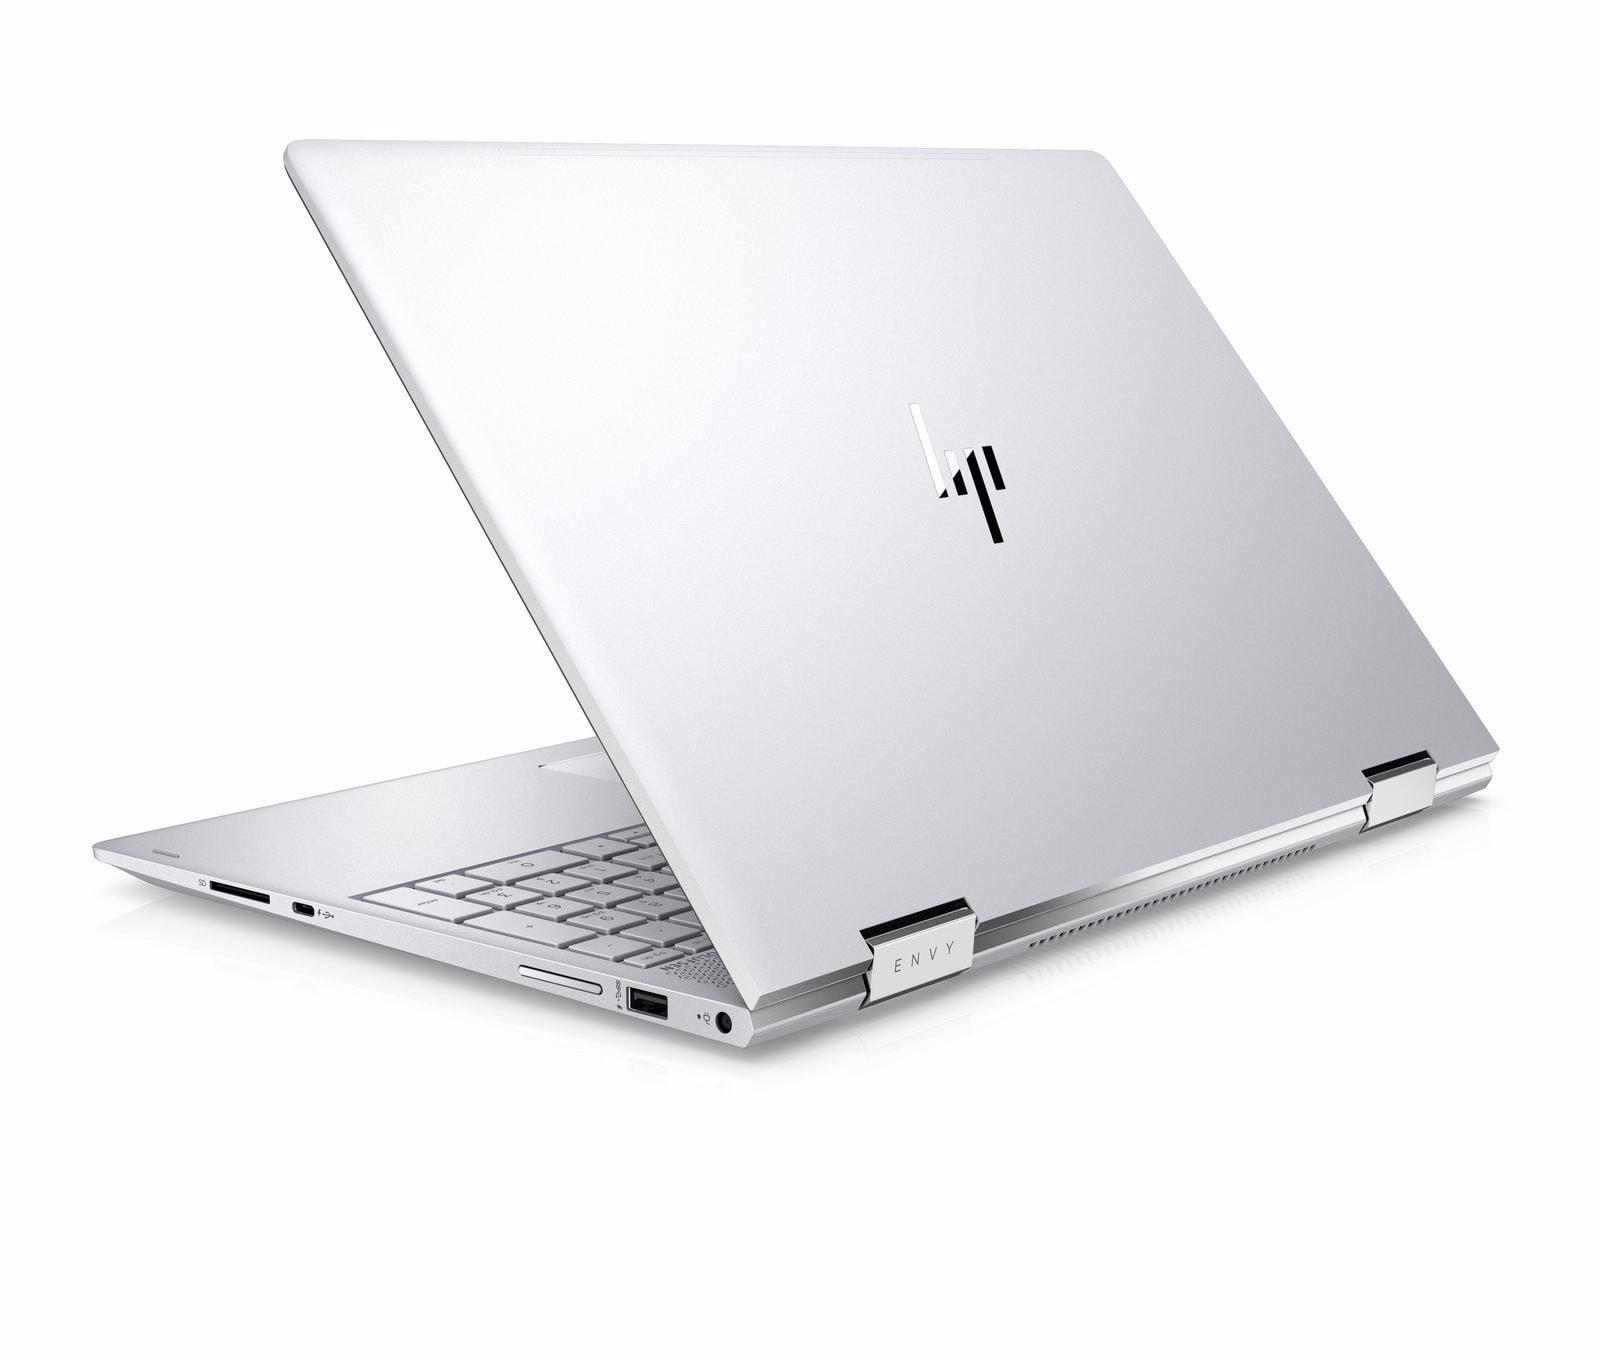 HP Envy x360 2017 (1)